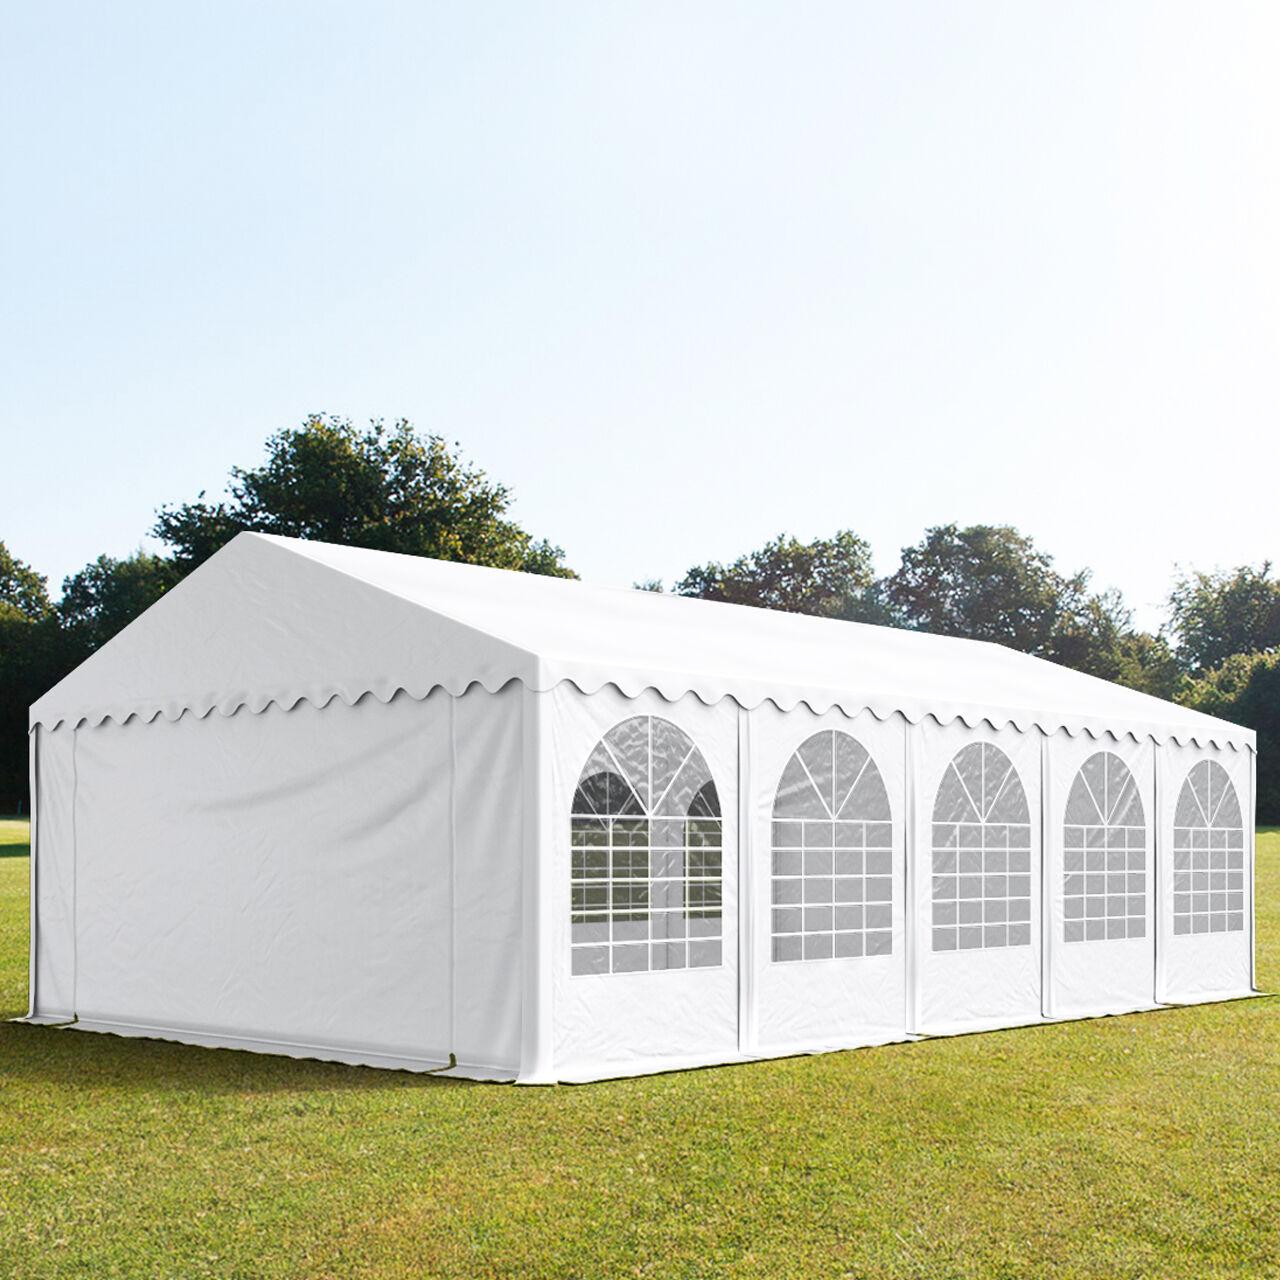 Toolport Tendone per Feste 5x10m PVC 550 g/m² bianco impermeabile